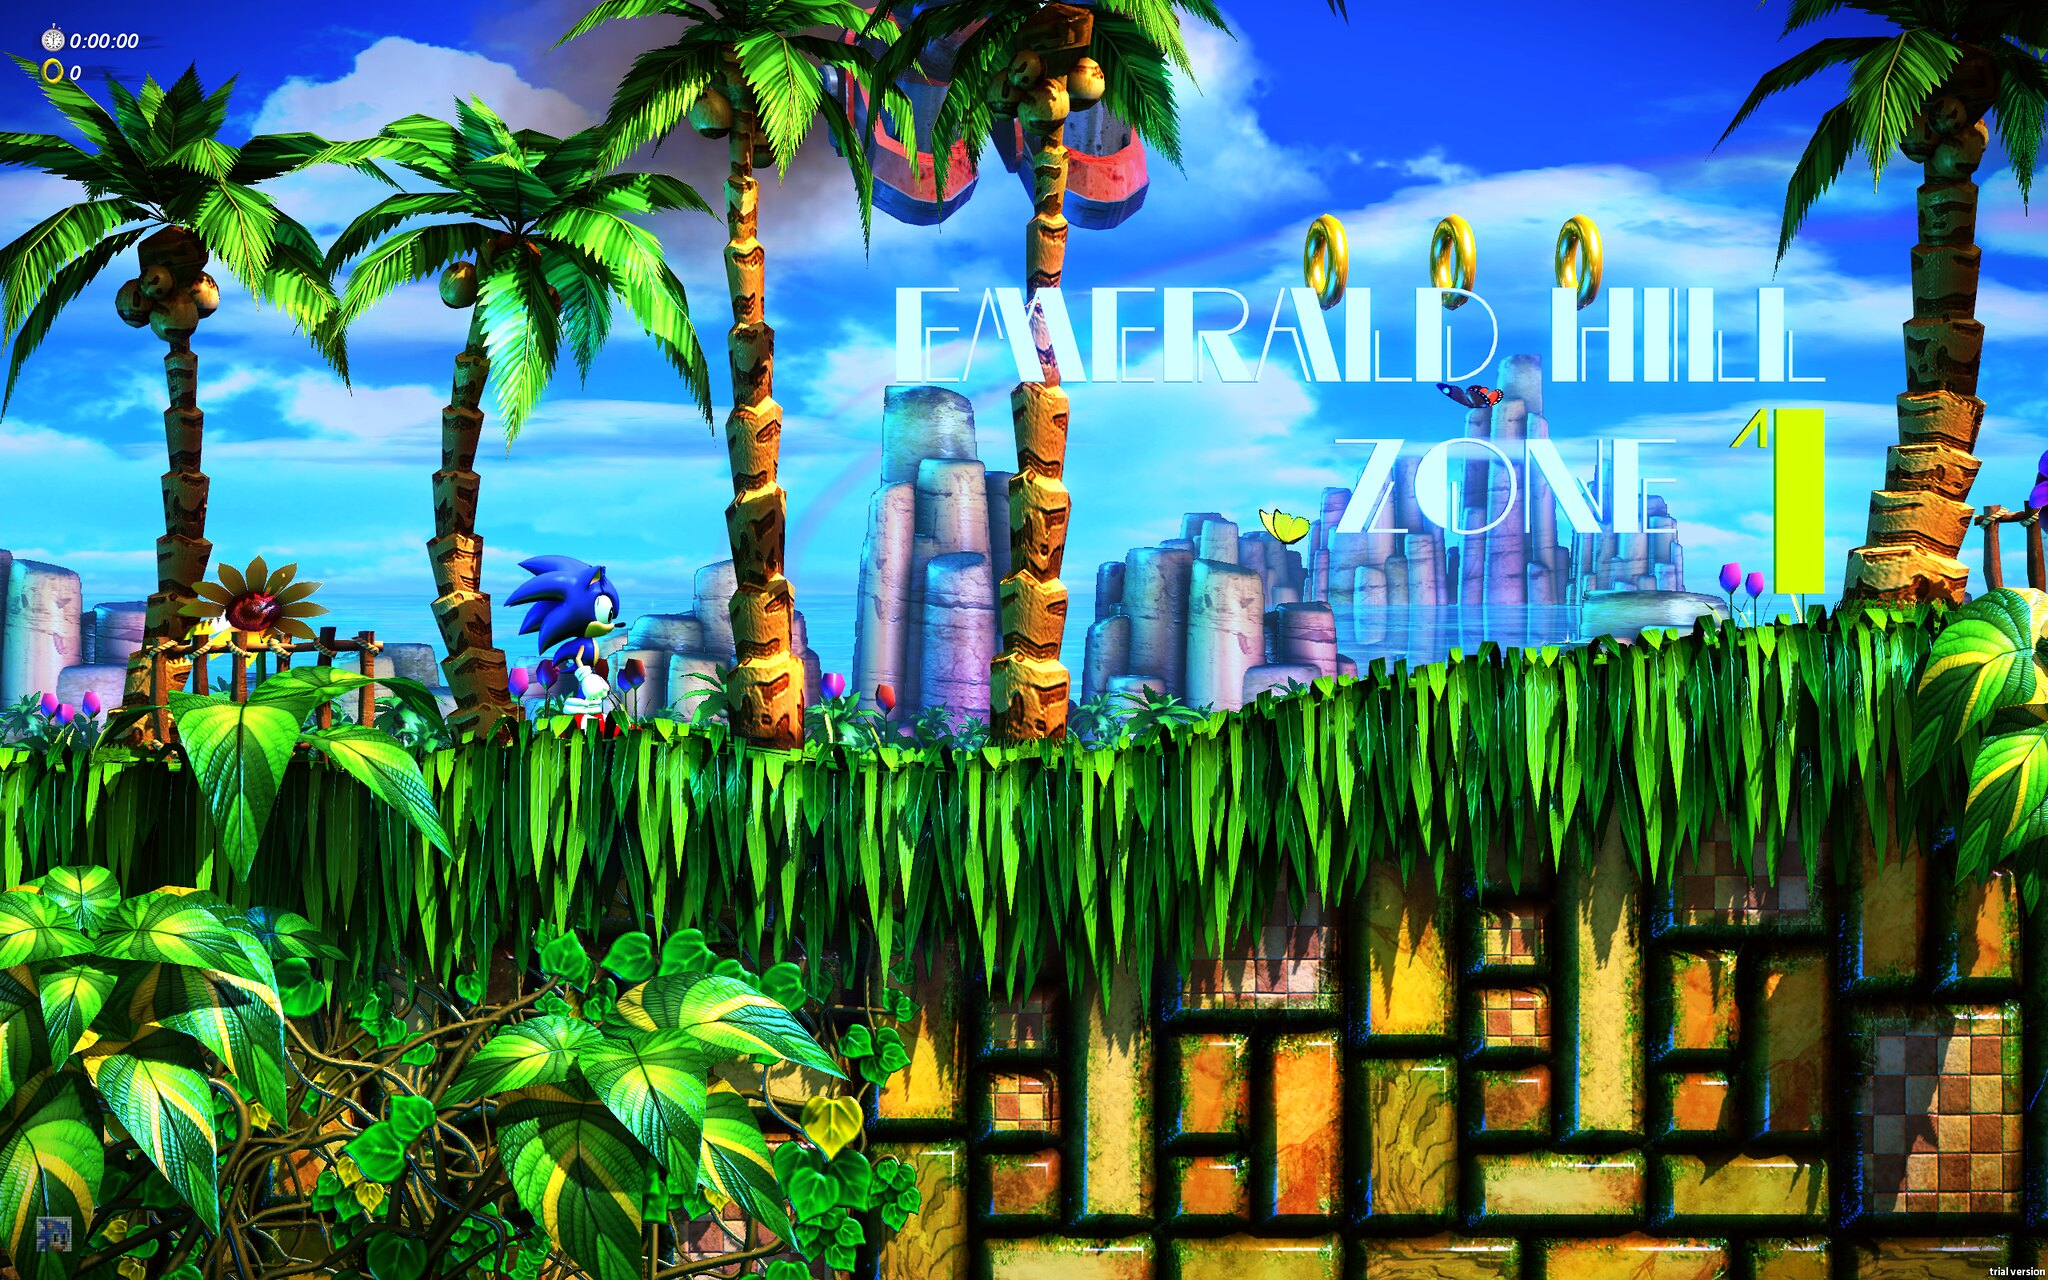 Emerald Hill Zone 2 HD Wallpaper • GamePhD